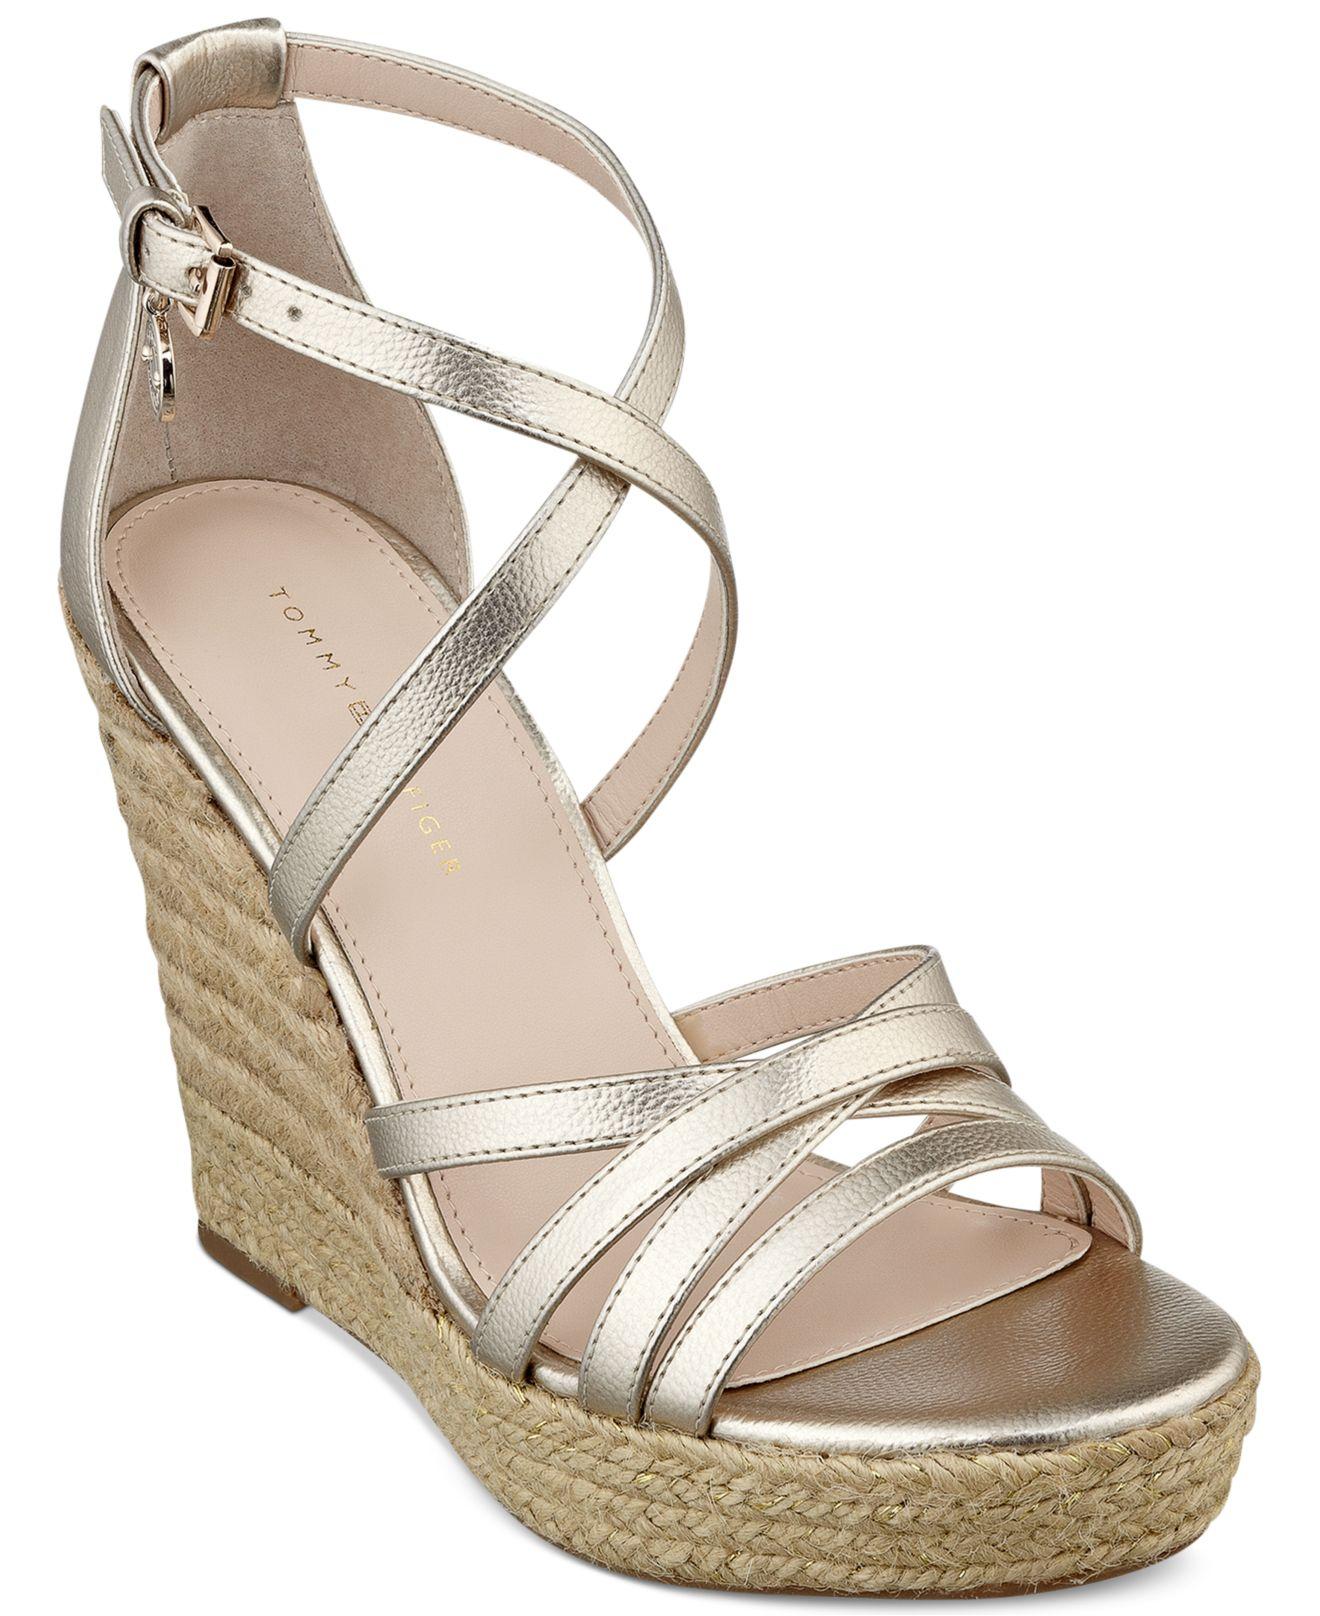 6b68d53a91 Lyst - Tommy Hilfiger Women S Venitia Platform Wedge Sandals in Metallic